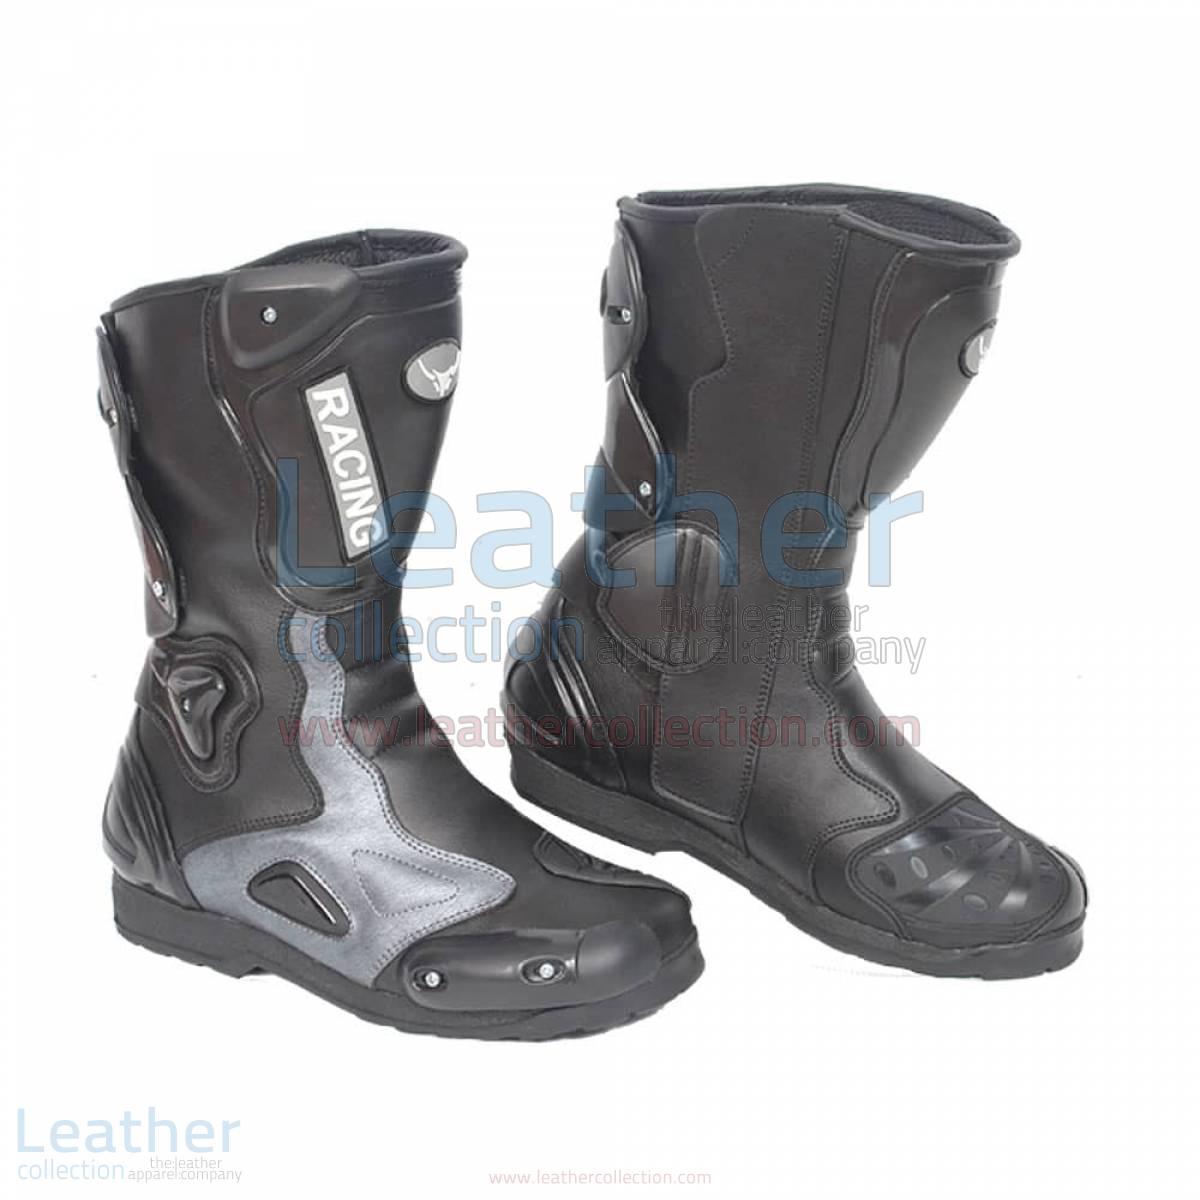 alpha moto racing boots